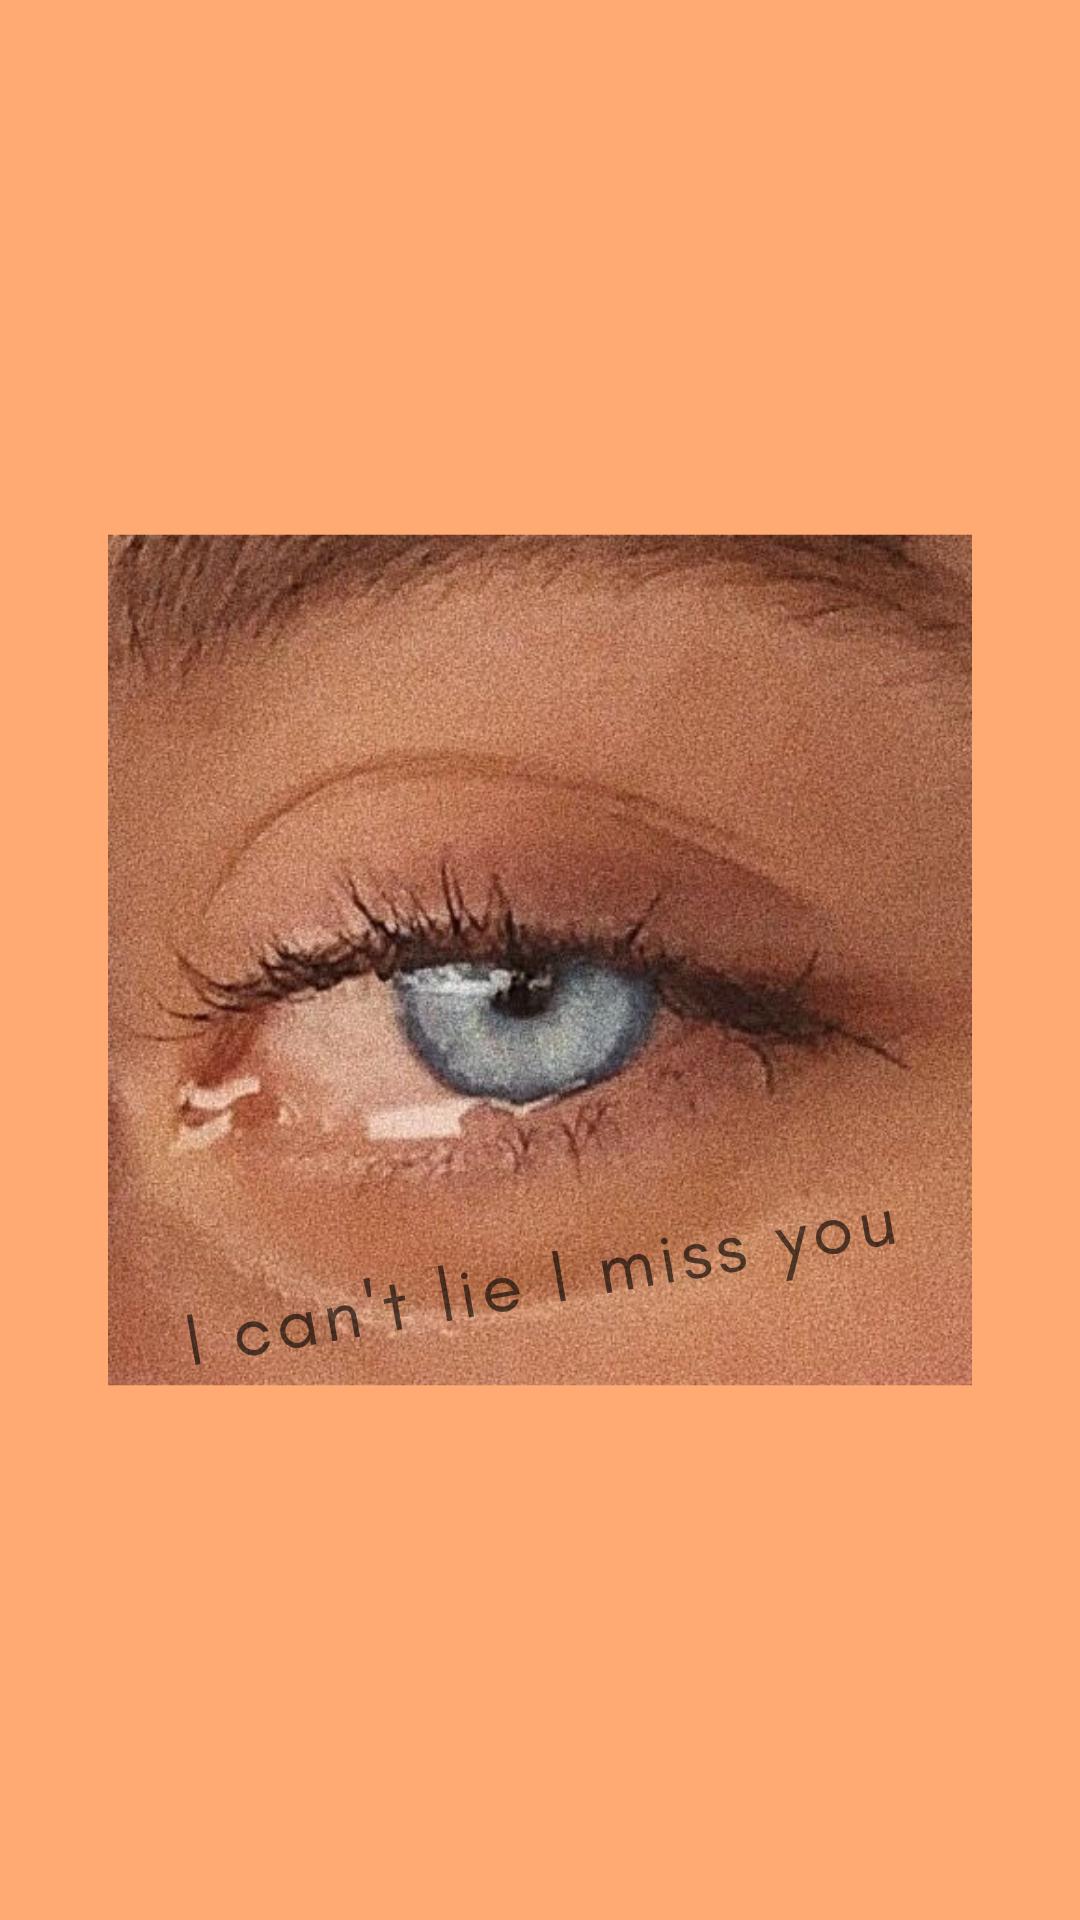 song lyrics in 2020 Song lyrics, I miss you, Miss you